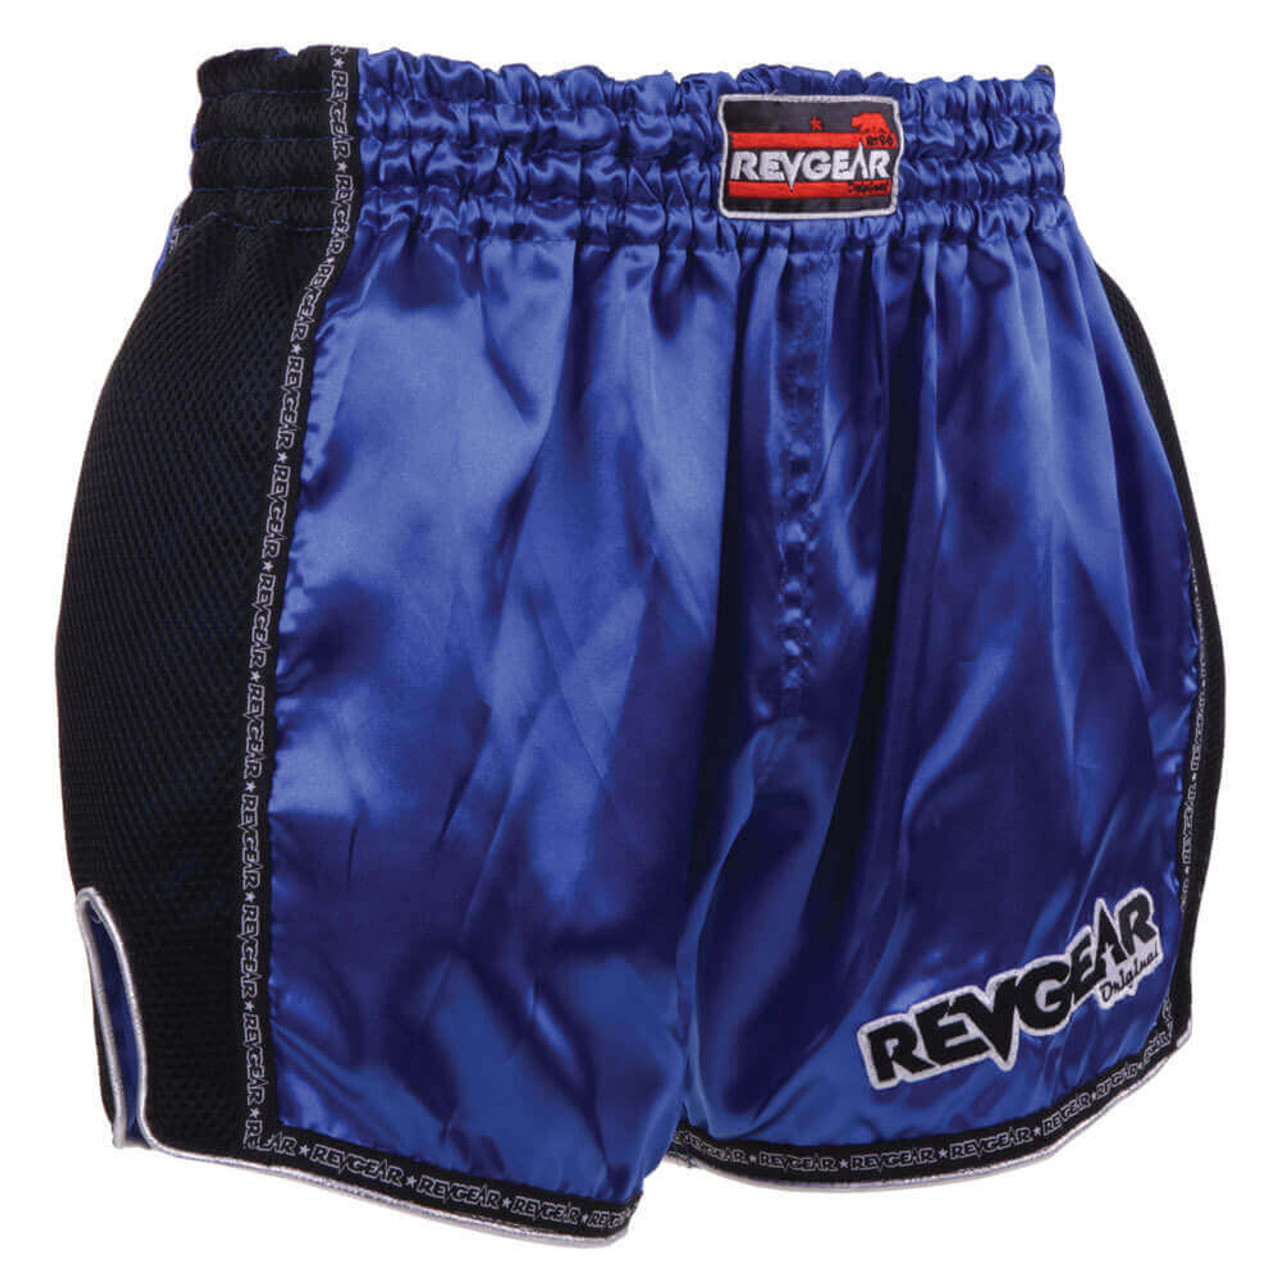 Thai Original Low Waist Muay Thai Short - Blue